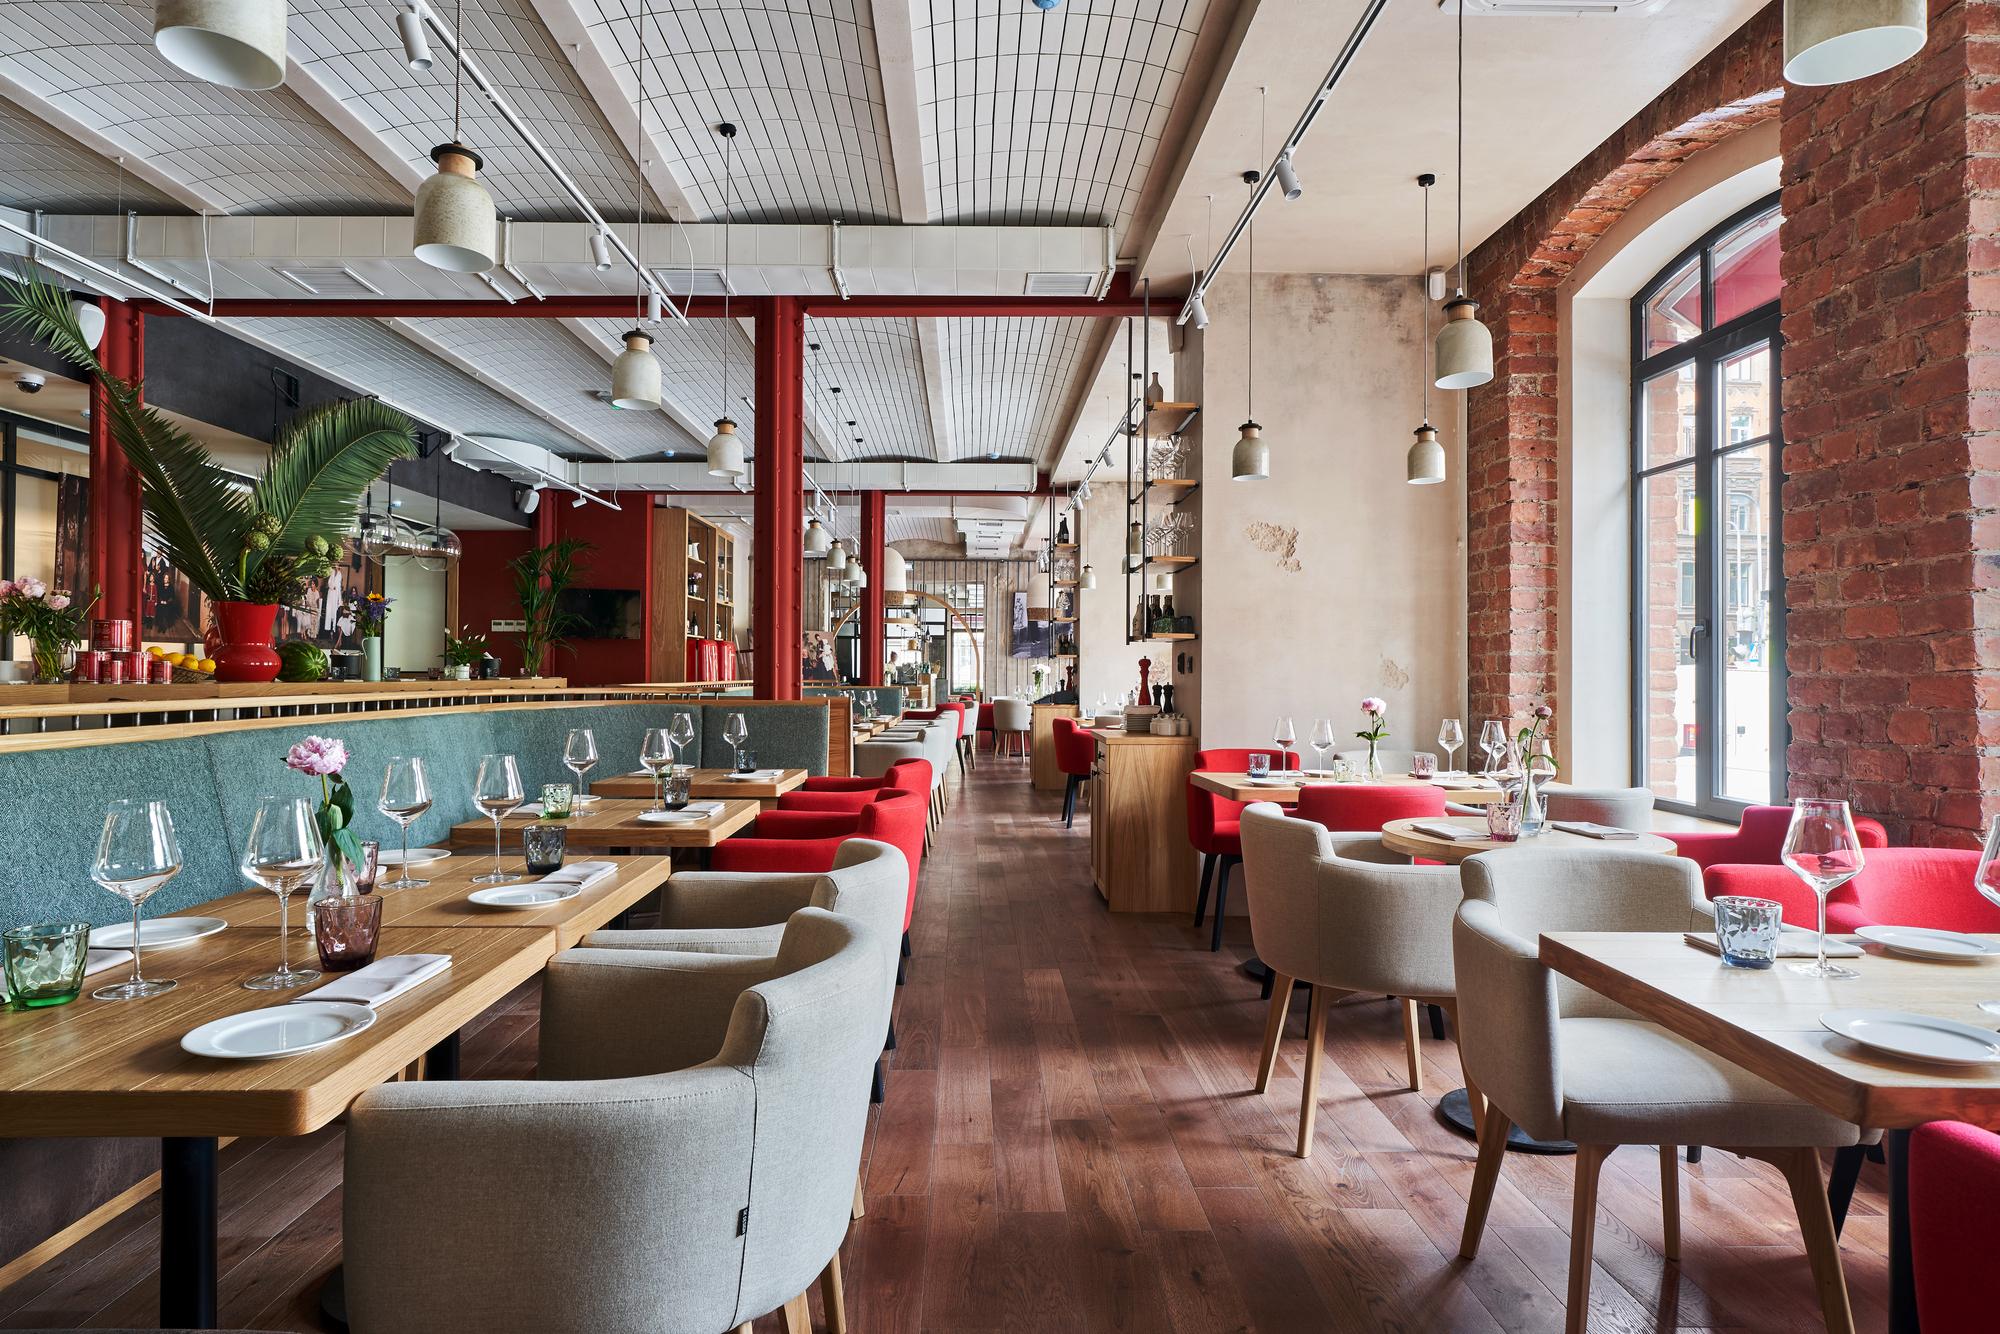 Italy Restaurant Paum Design Archdaily